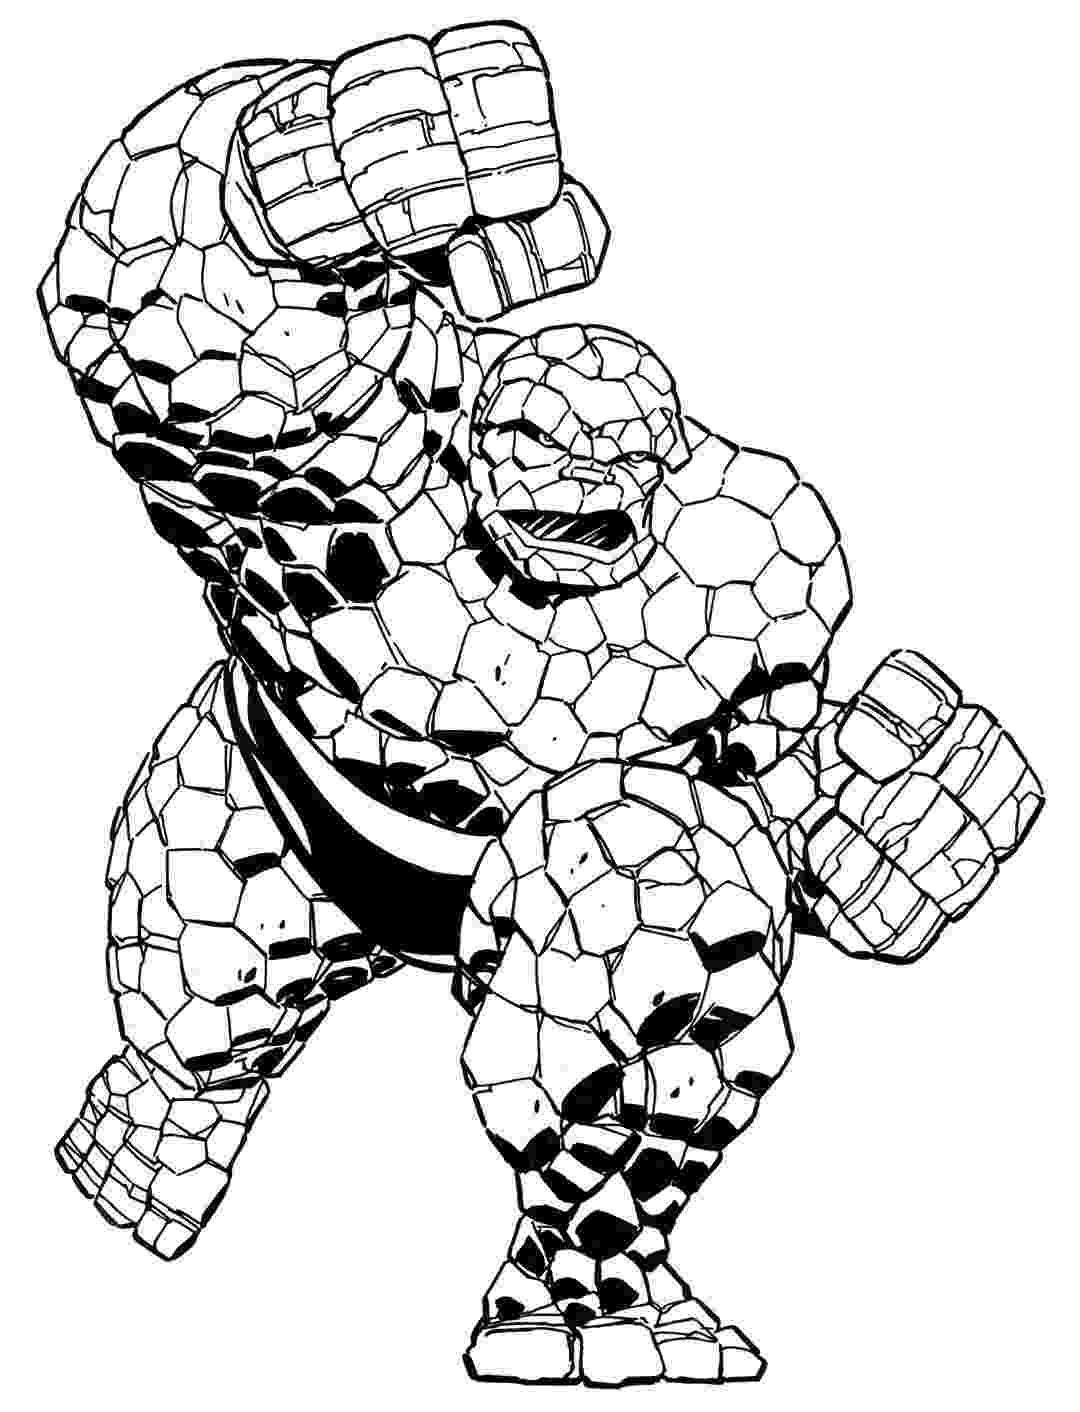 superhero coloring page best 146 superhero coloring pages images on pinterest coloring superhero page